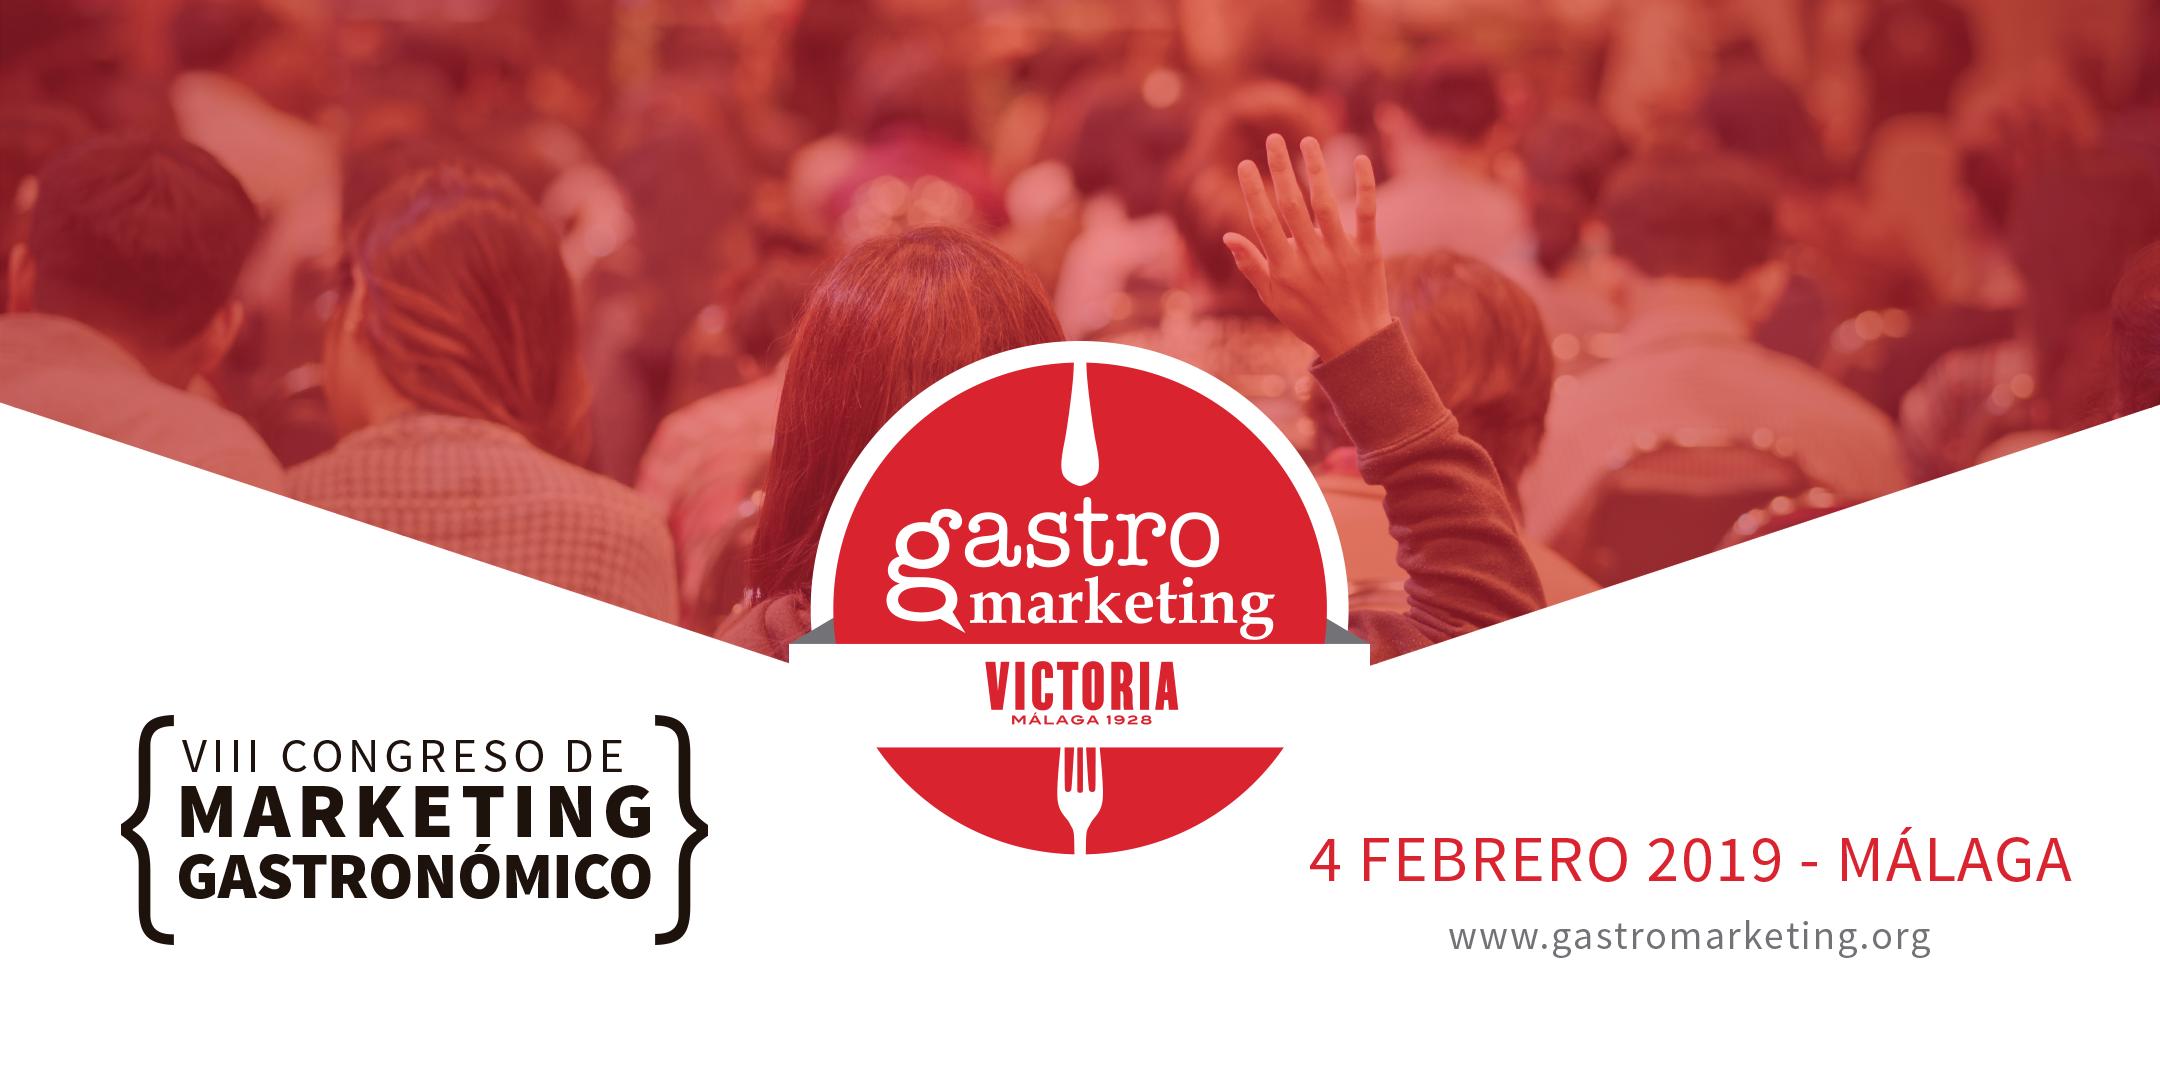 Gastroamrketing 2019